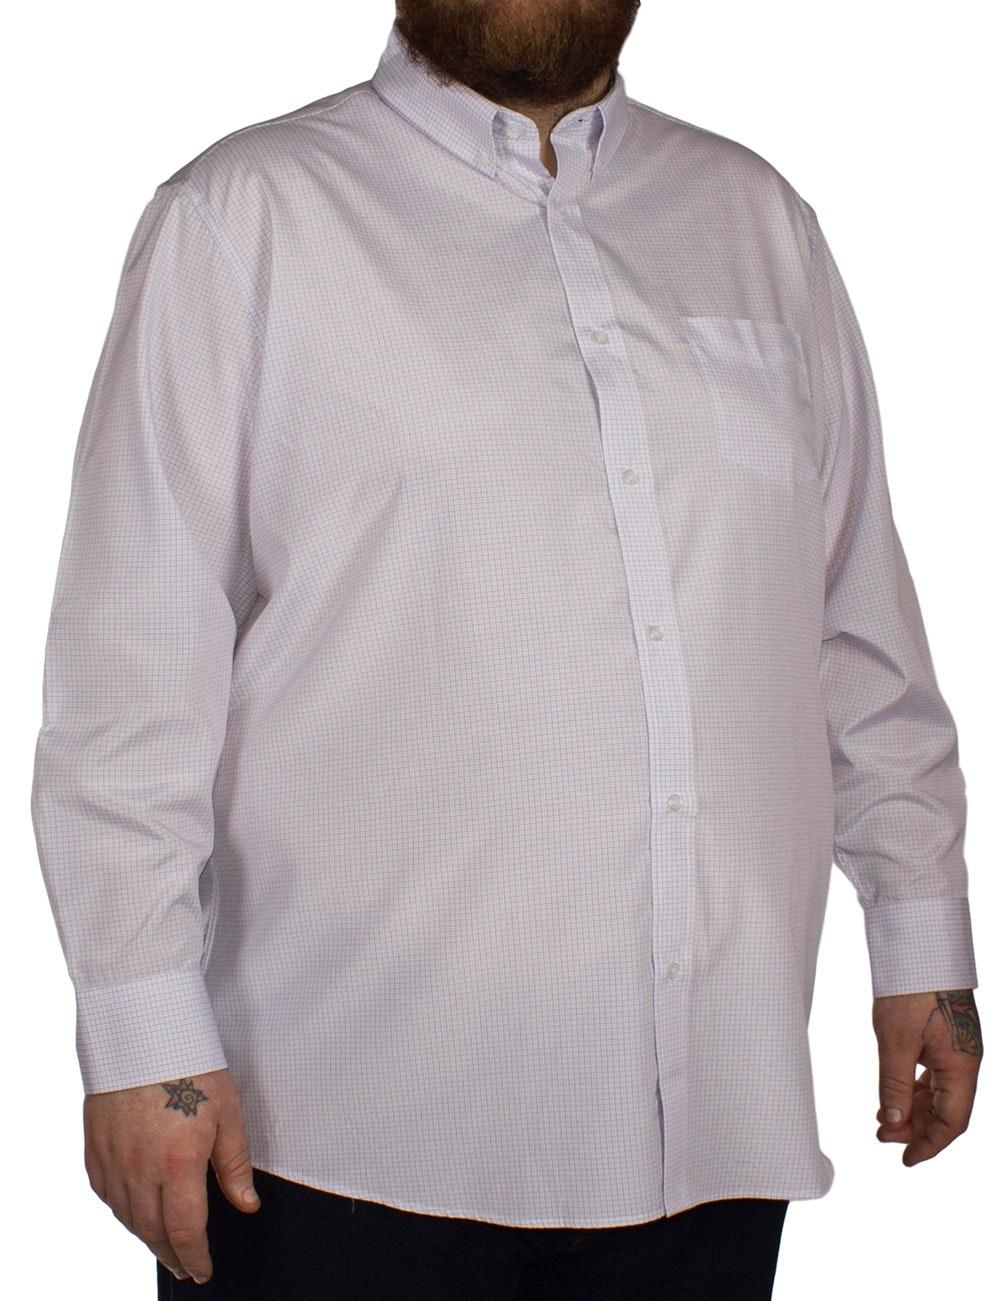 Carabou Check Long Sleeve Shirt Pink